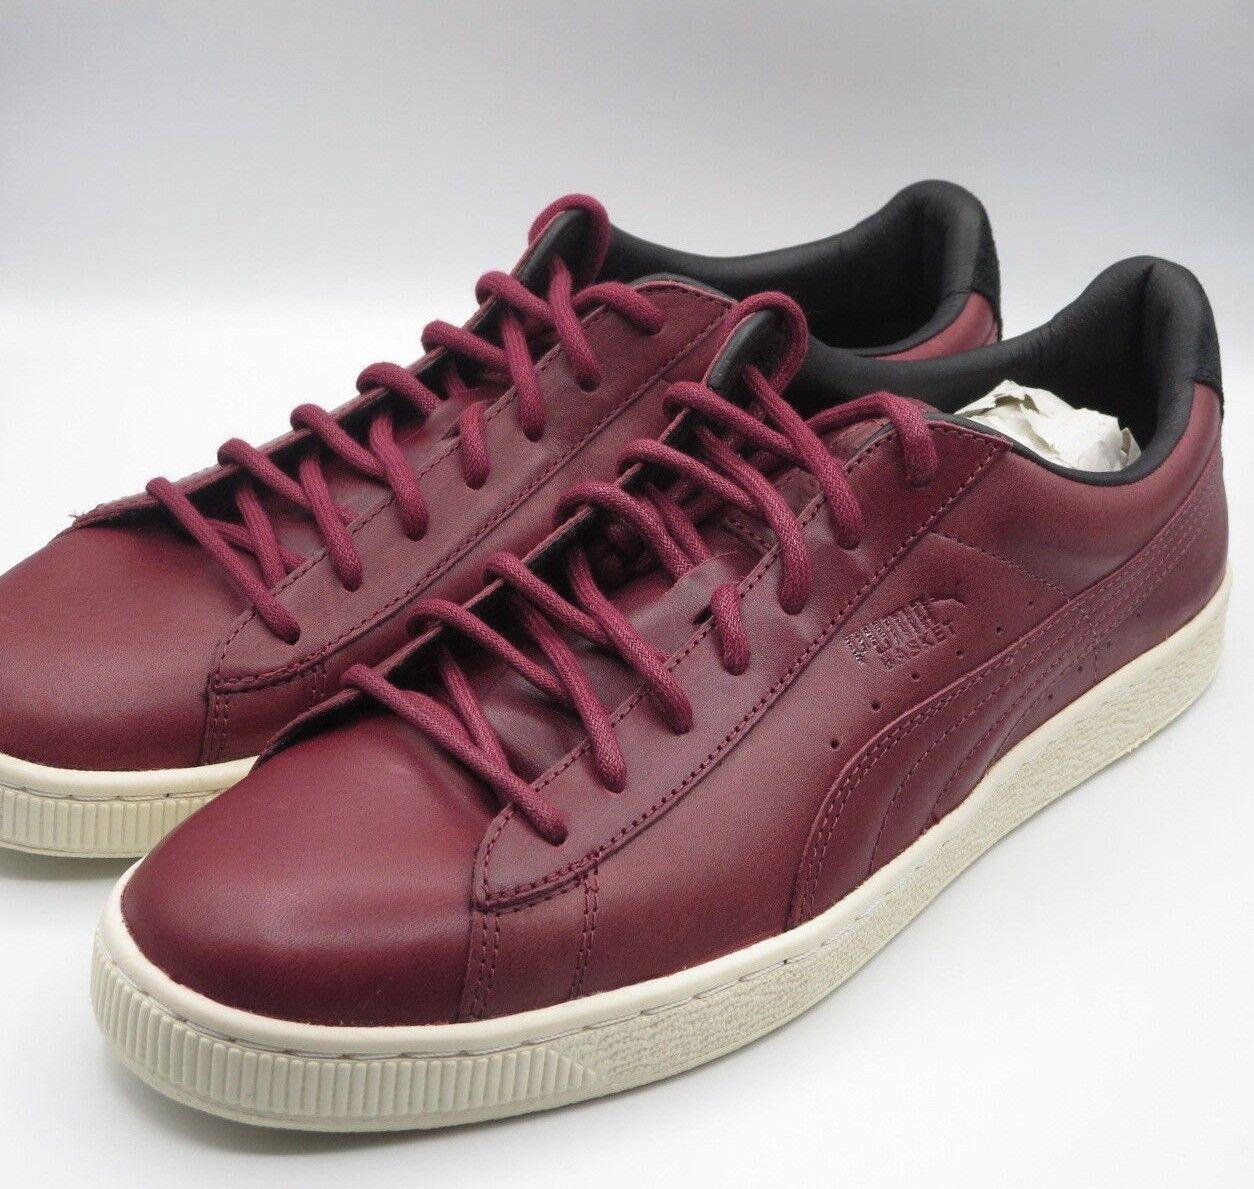 Puma Basket Retro Maroon Burgundy Red Uomo Fashion  Shoes Size 10.5